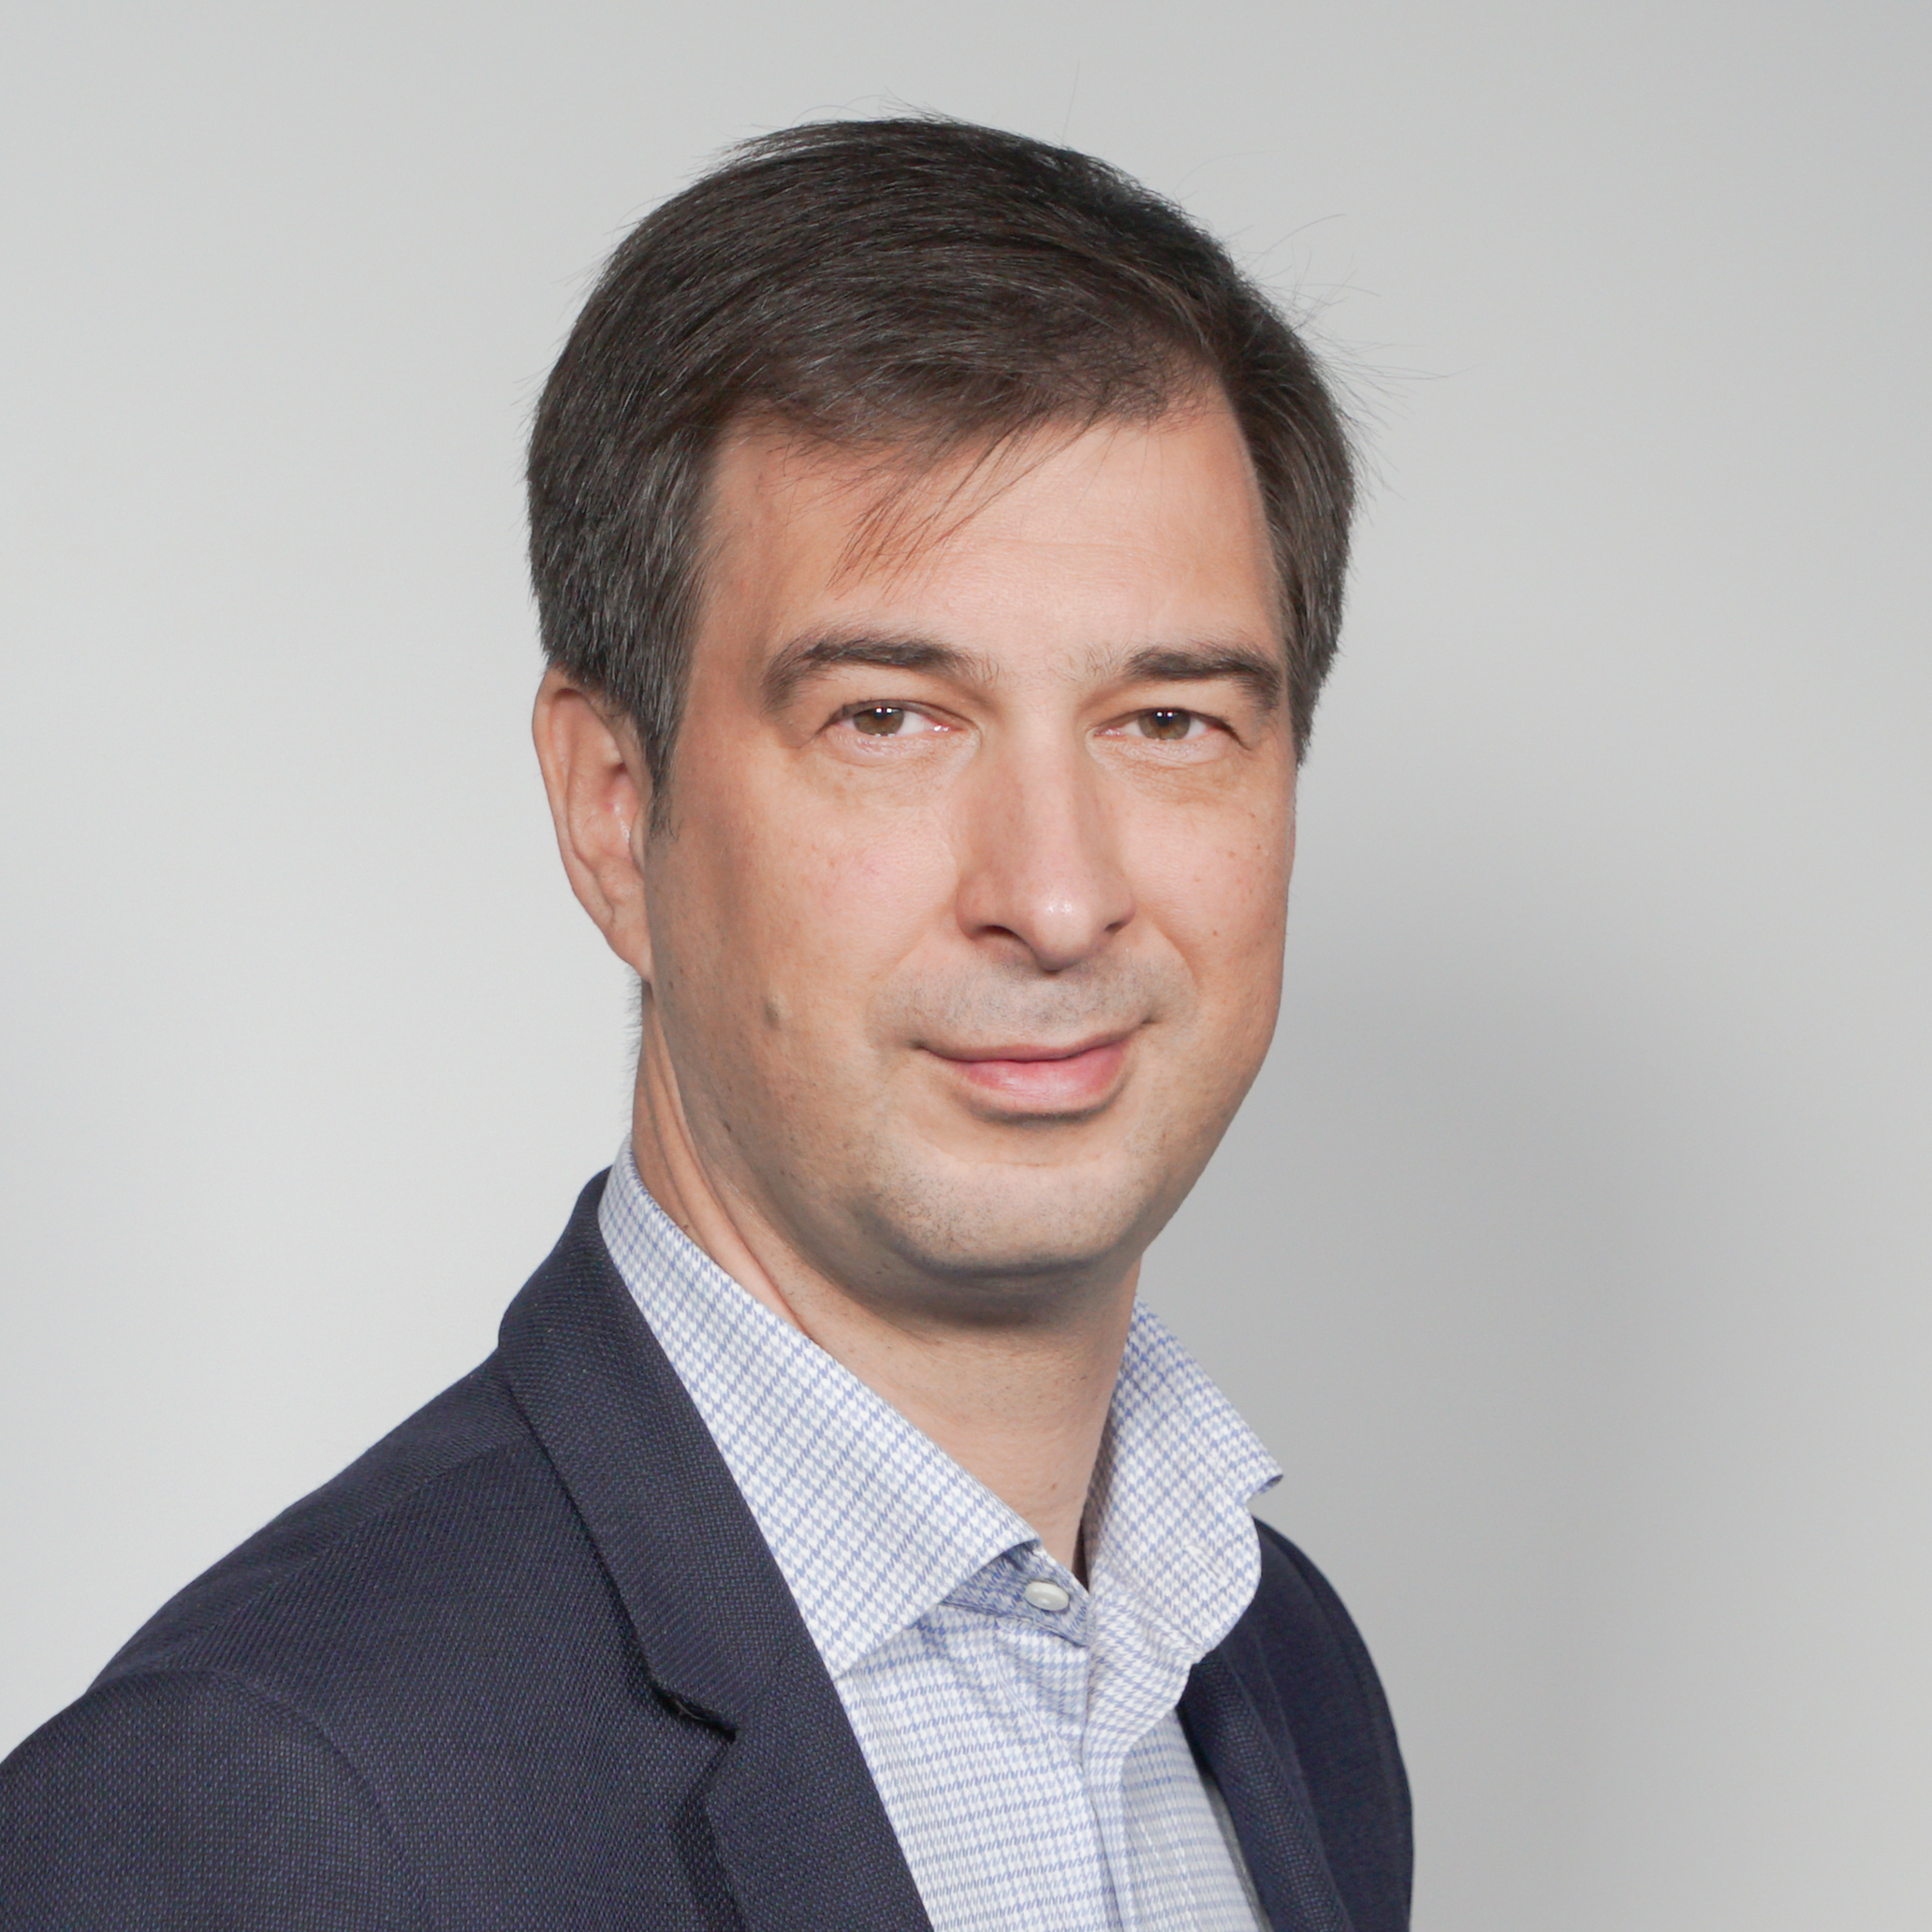 Vladimir Stroyev